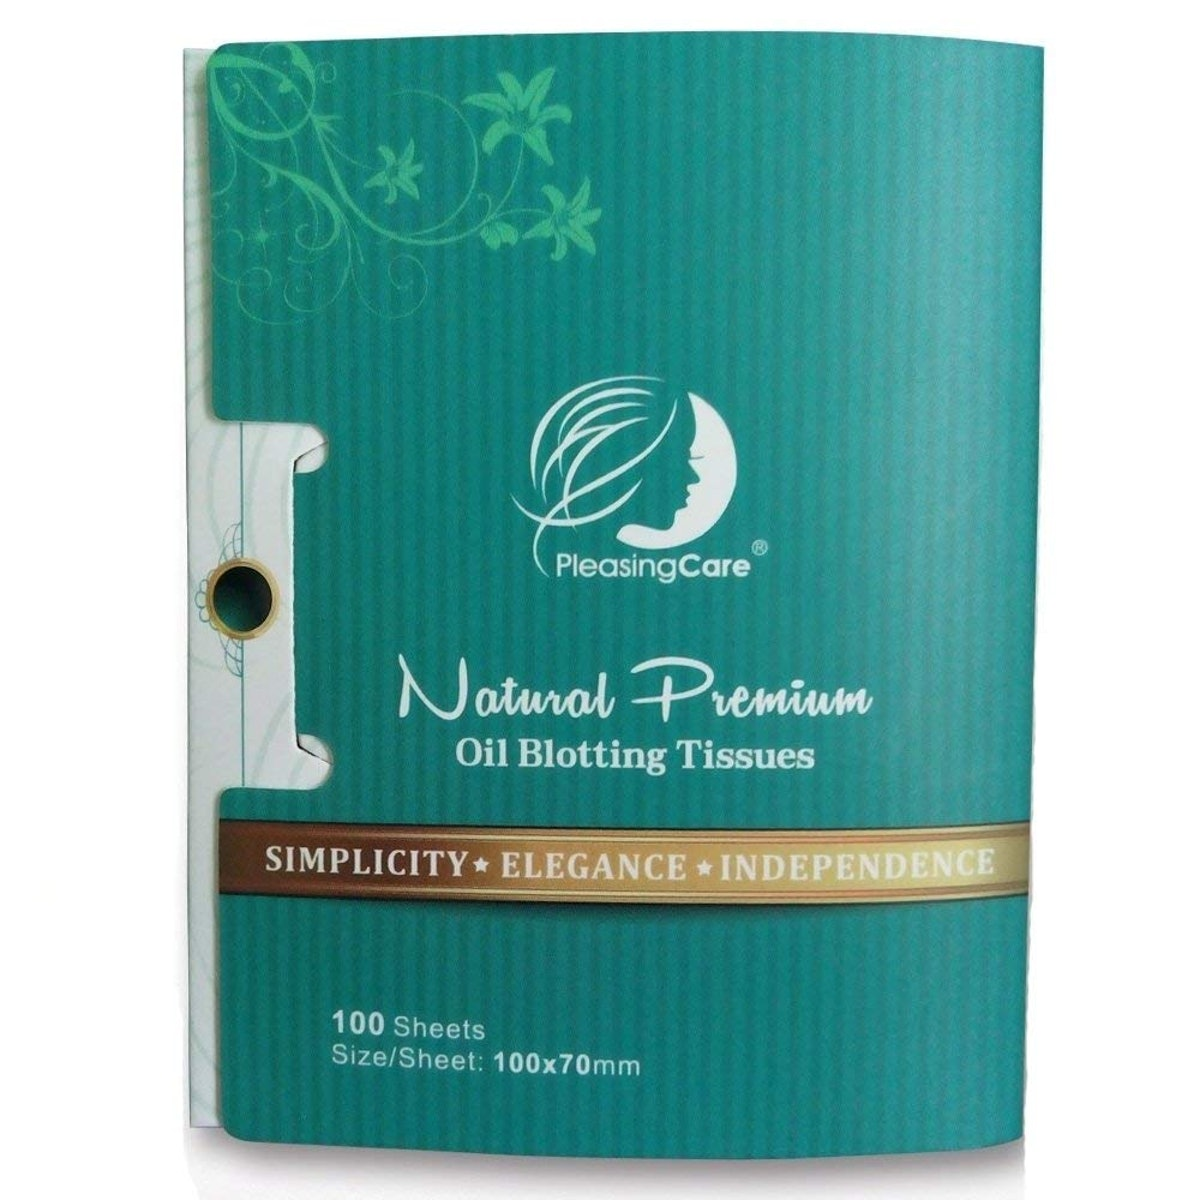 PleasingCare Oil-Absorbing Tissues